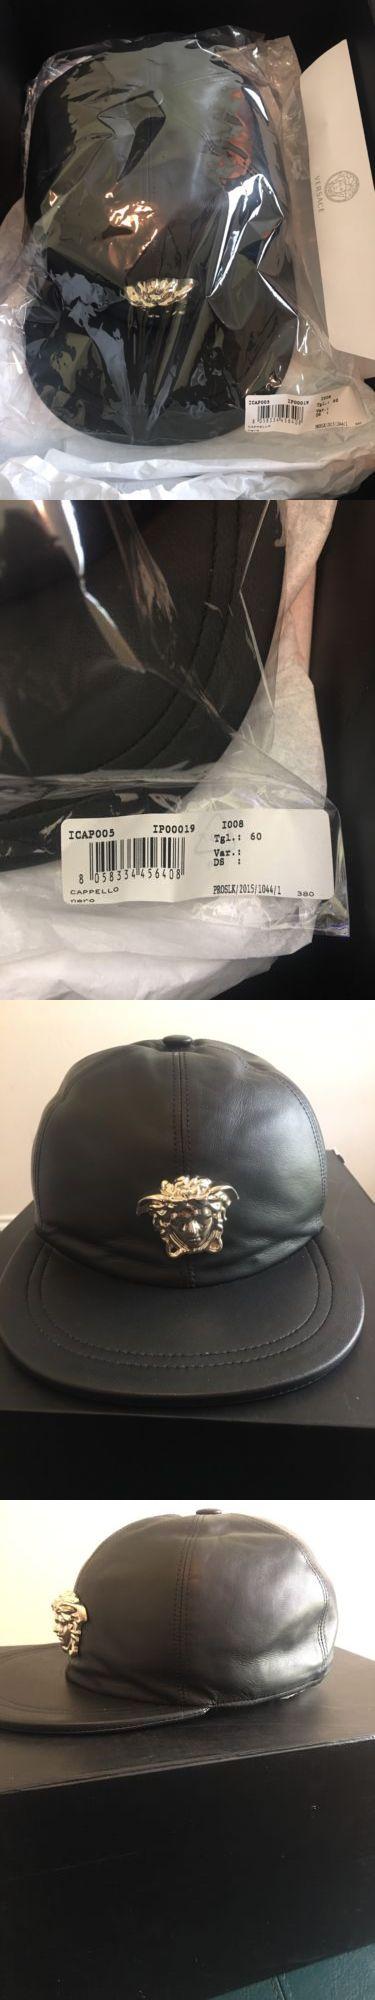 Hats 163543: Versace Medusa Cappello Leather Baseball Cap Sz. 60Cm Icap005ip00019 -> BUY IT NOW ONLY: $350 on eBay!